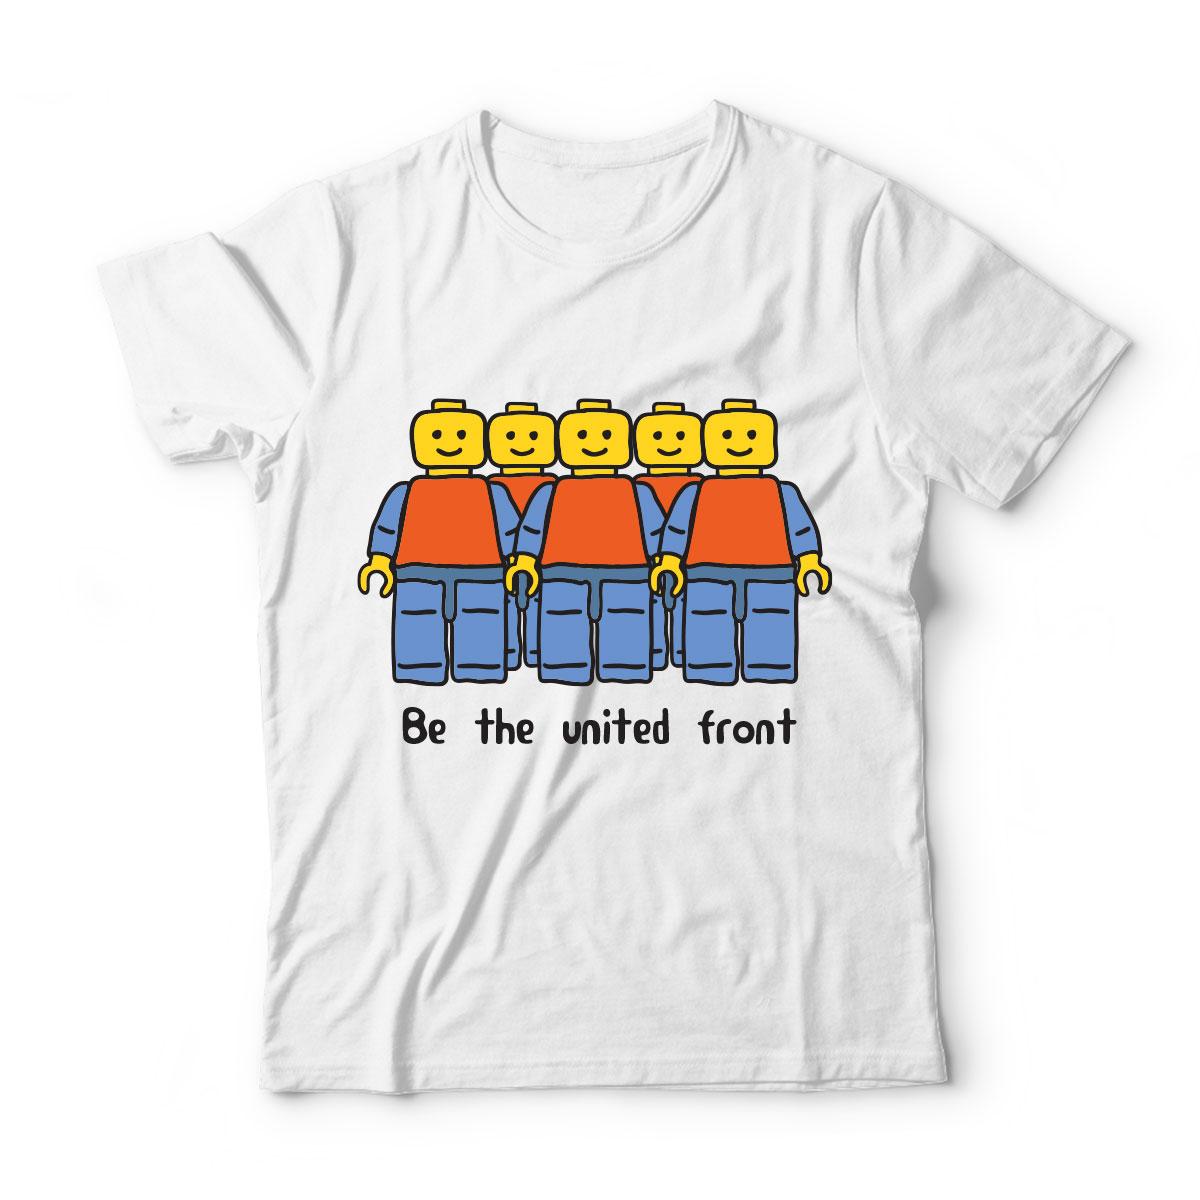 Custom Designed & Screen Printed T-shirts